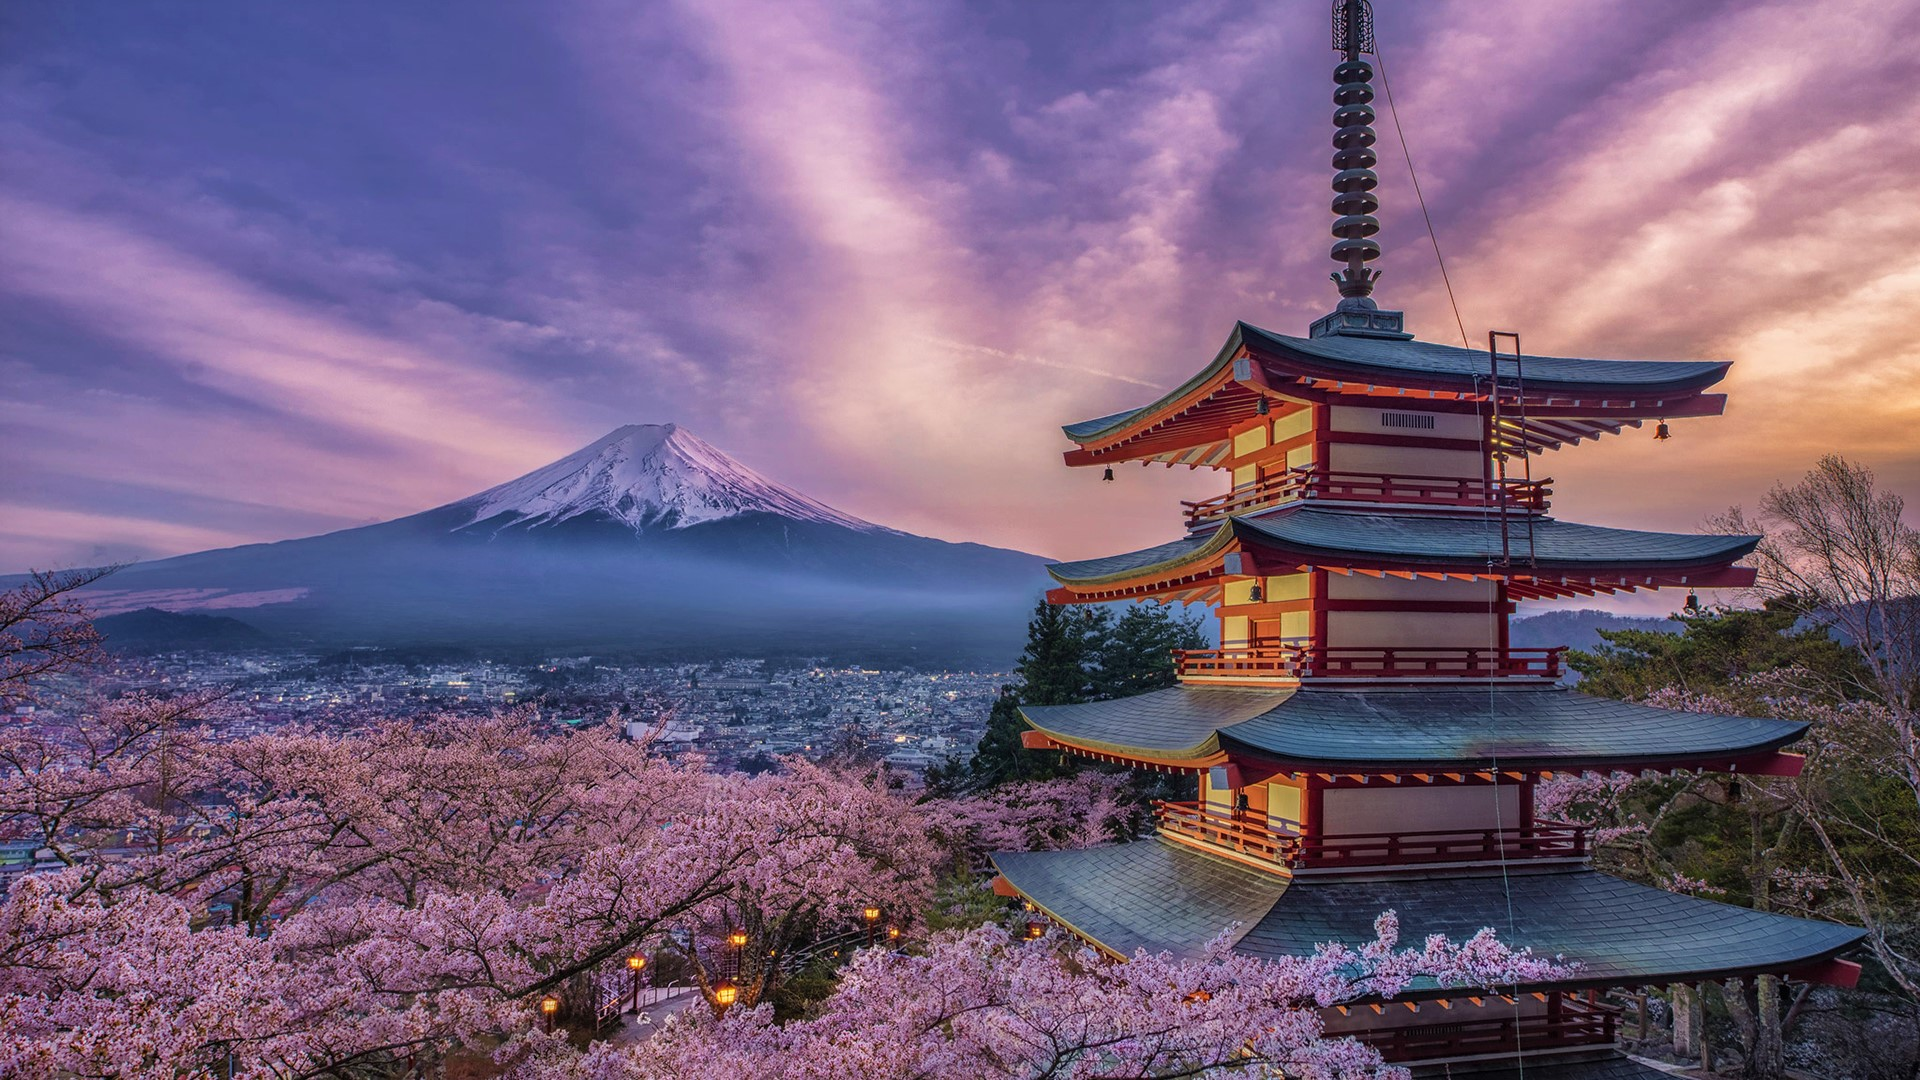 Mount Fuji Wallpaper Iphone Springtime In Japan Fond D 233 Cran Hd Arri 232 Re Plan